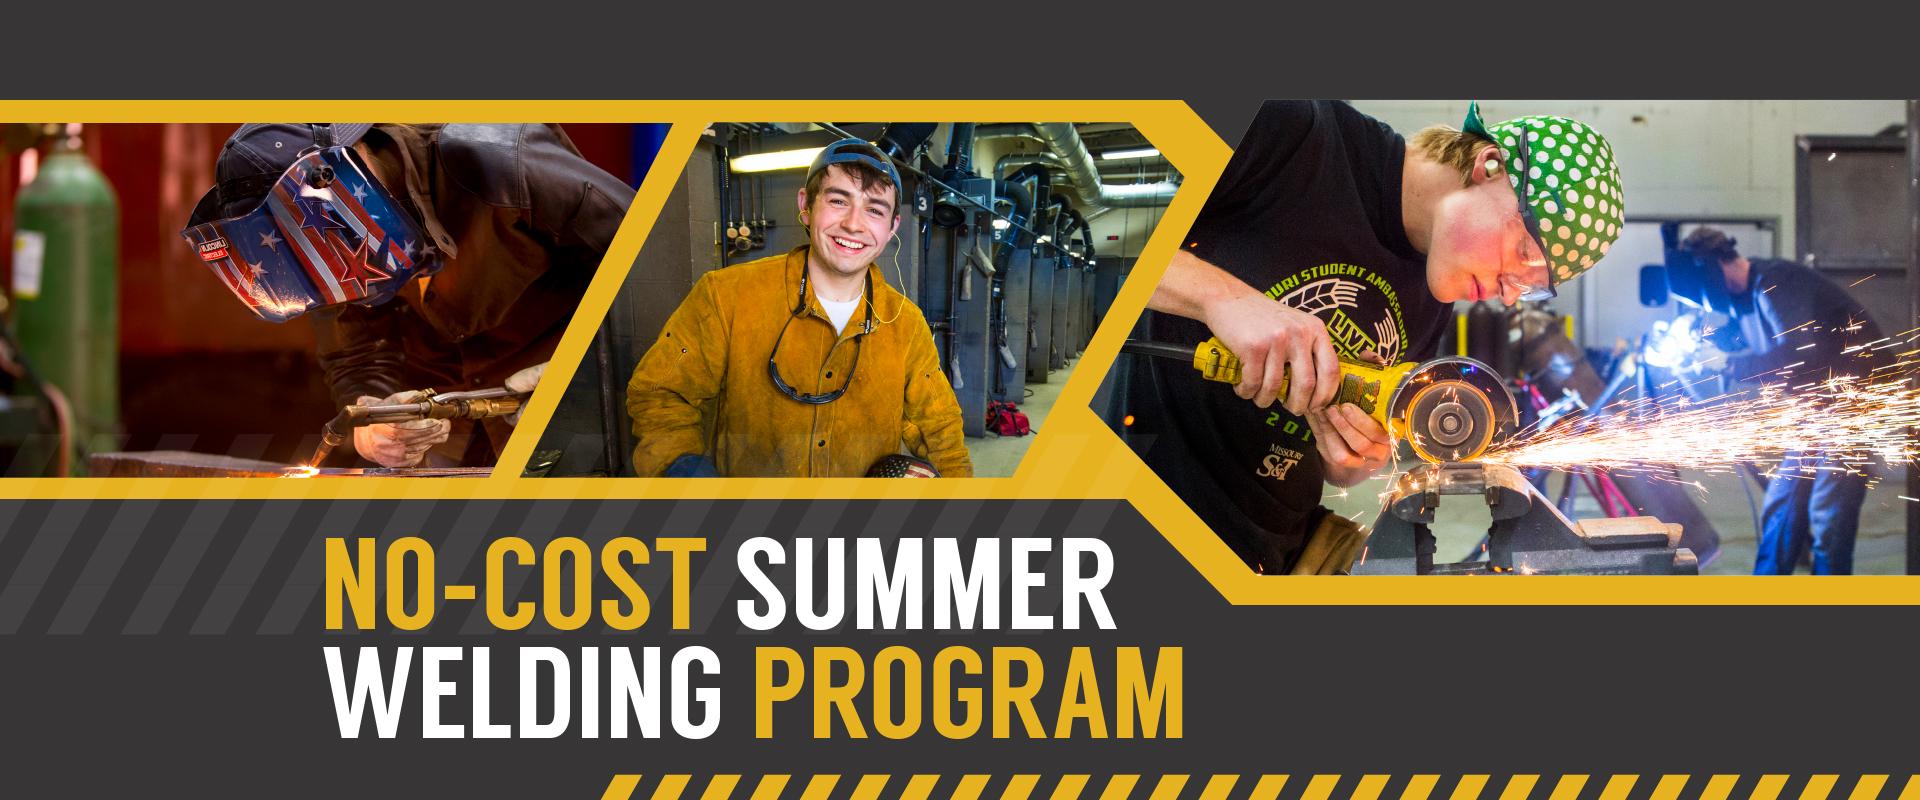 Summer Welding Program